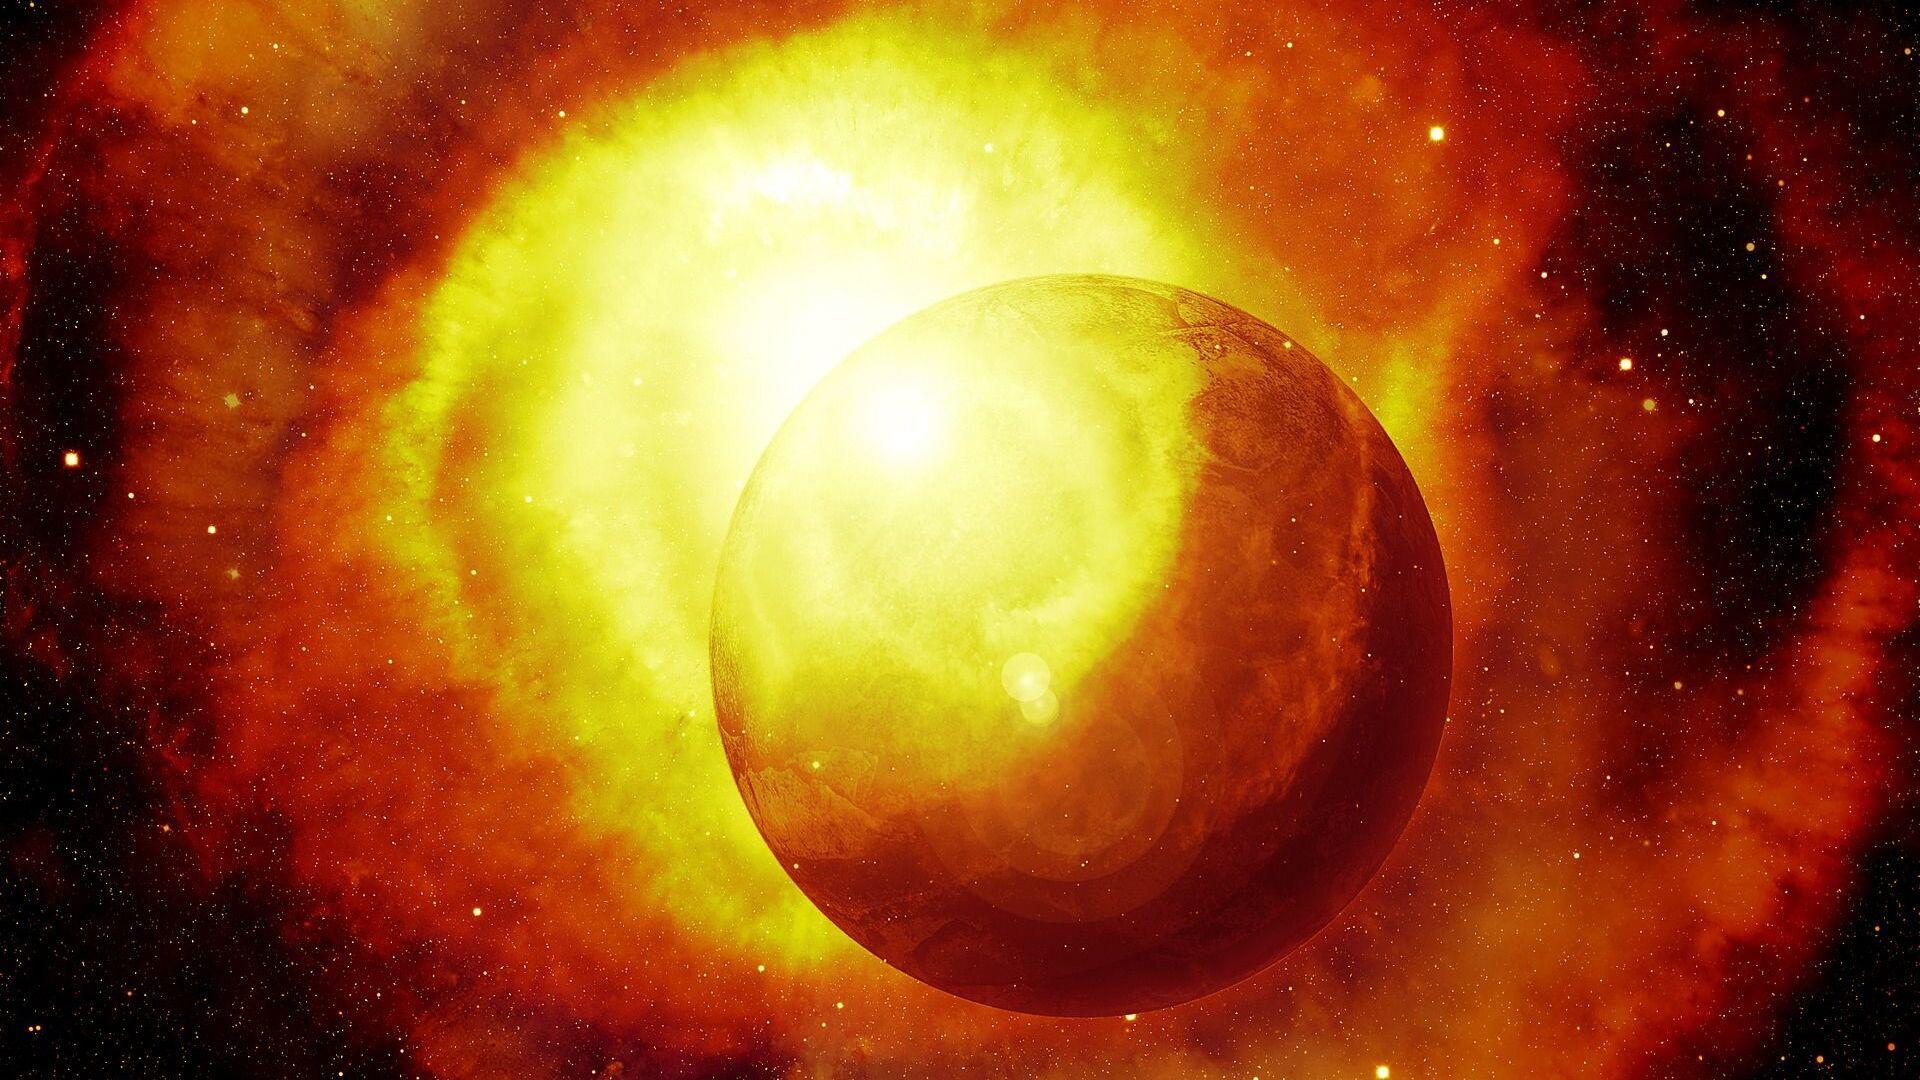 Un planeta (imagen referencial) - Sputnik Mundo, 1920, 12.10.2021